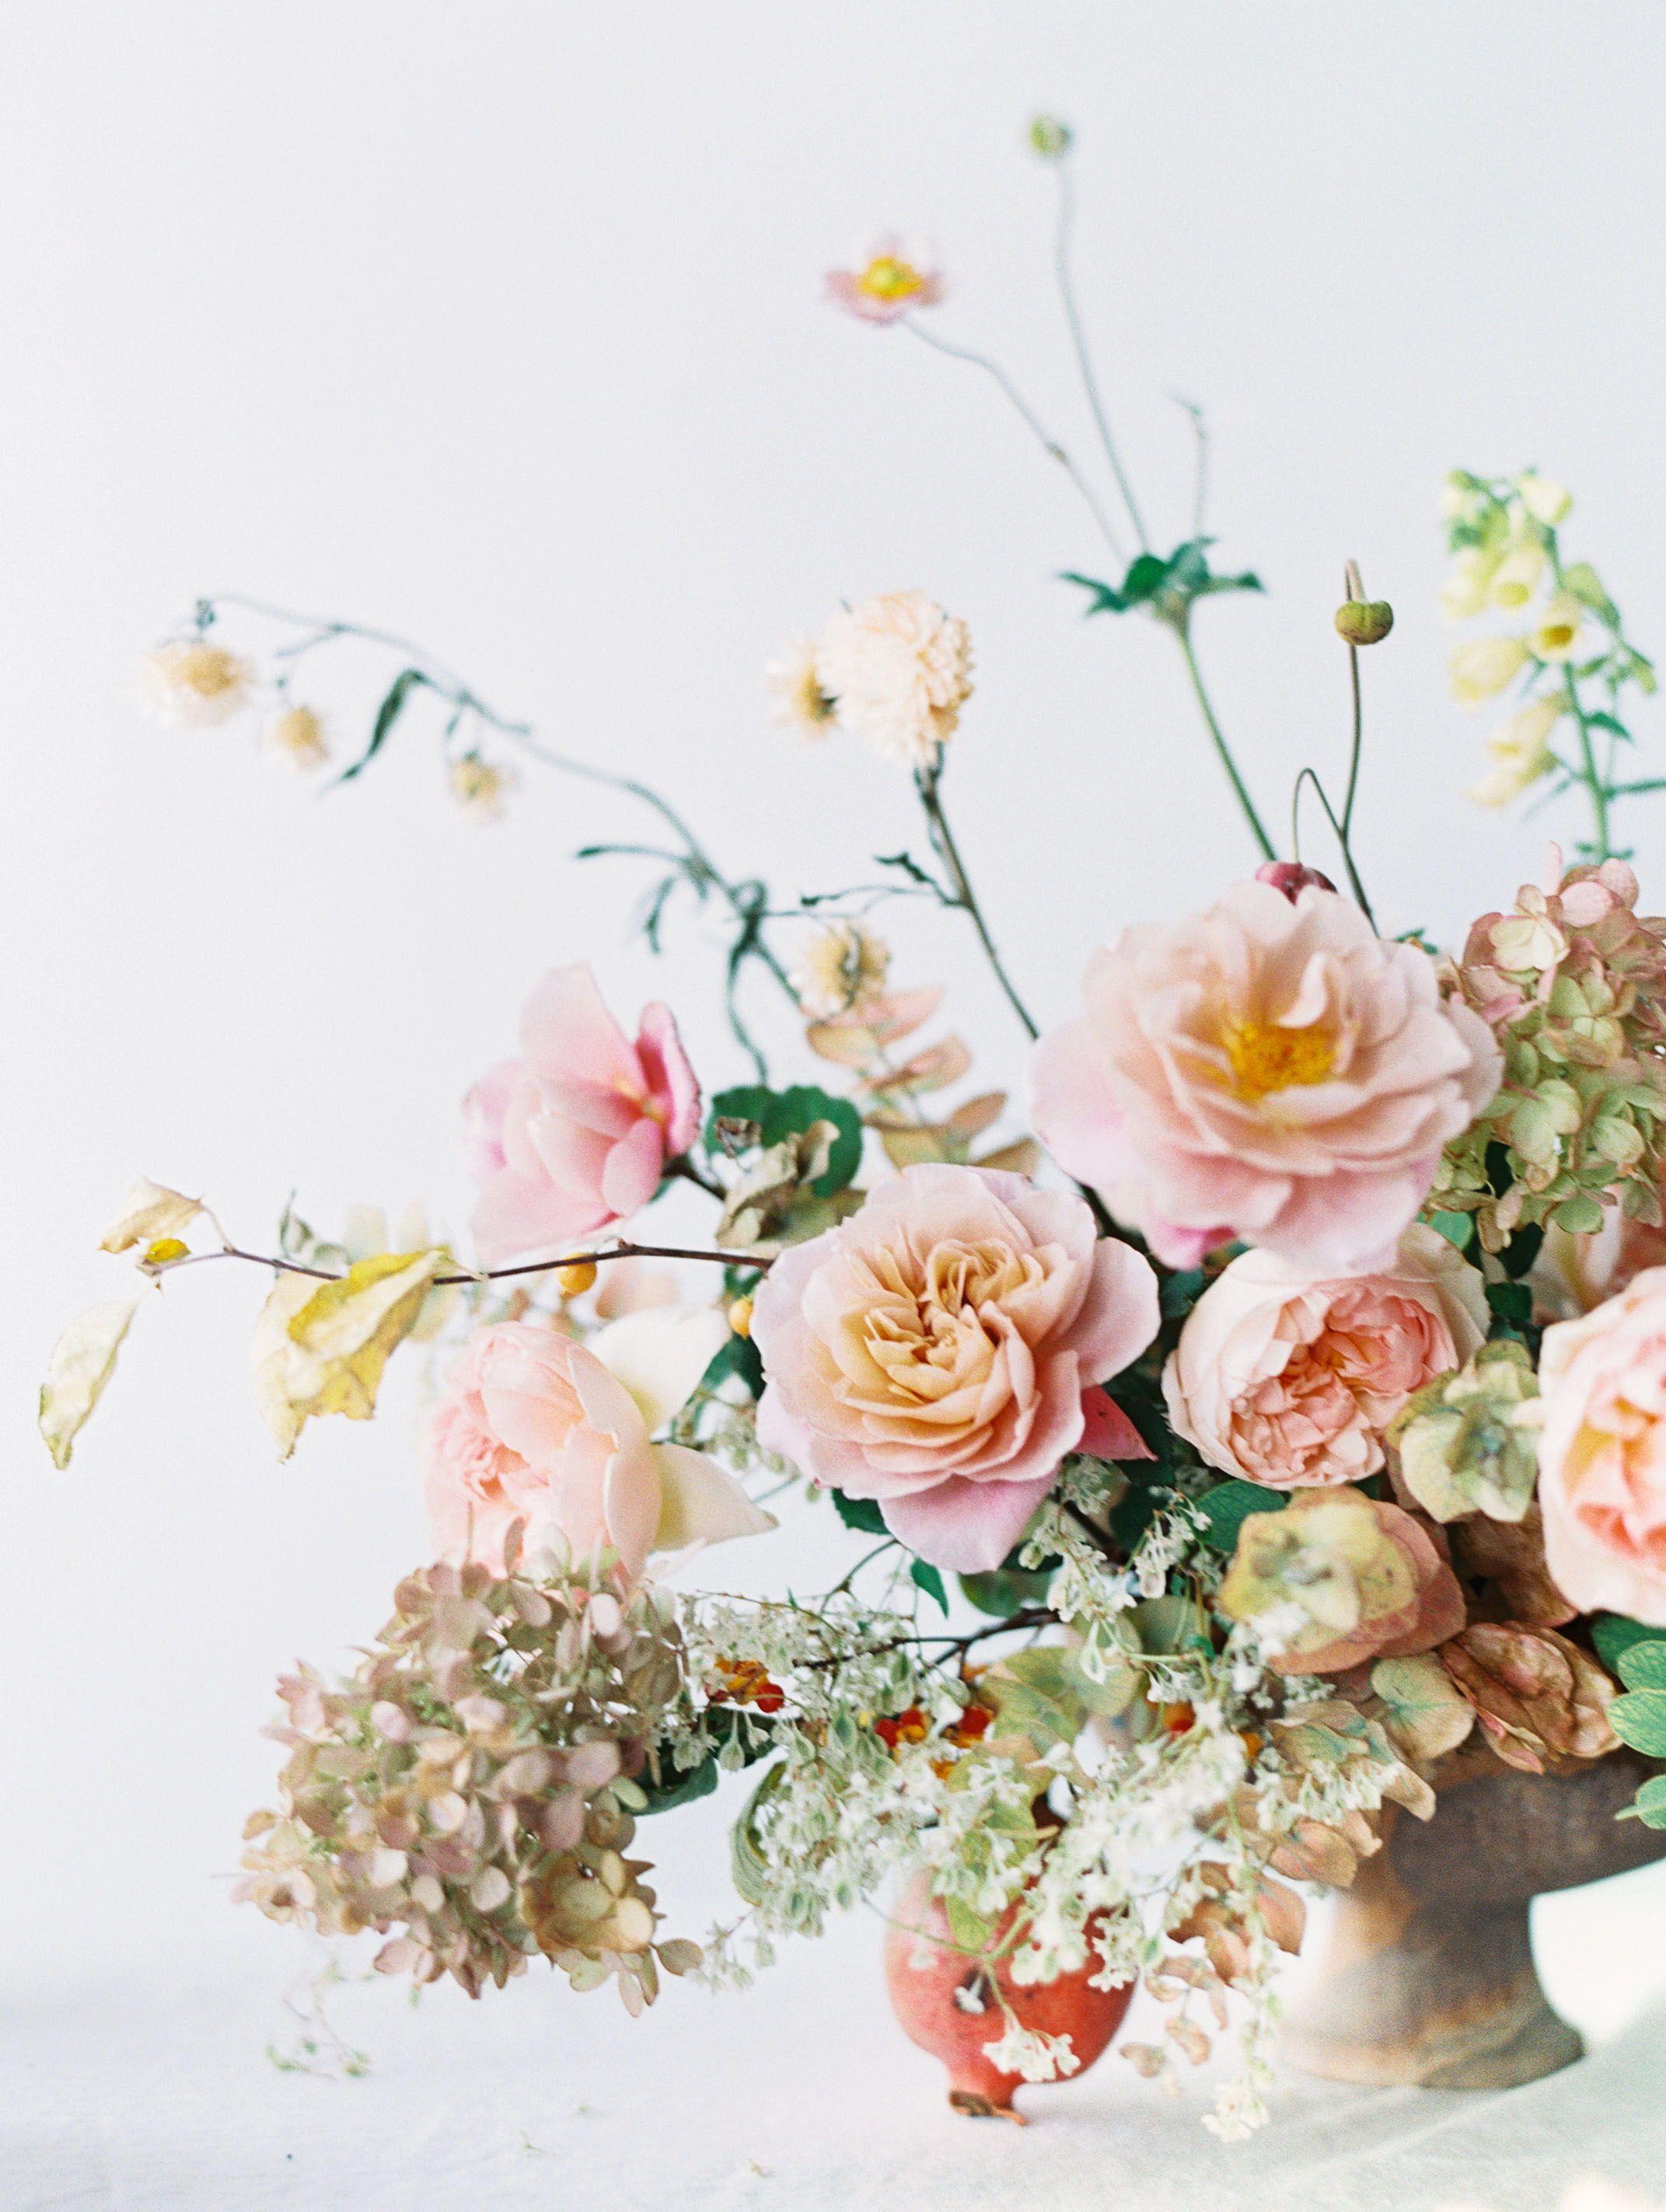 Spring Summer Bi Racial Wedding Minimalist Minimalism Loft Venue Dress Gown Cake Decoration Dec Wedding Flowers Summer Bright Wedding Flowers Wedding